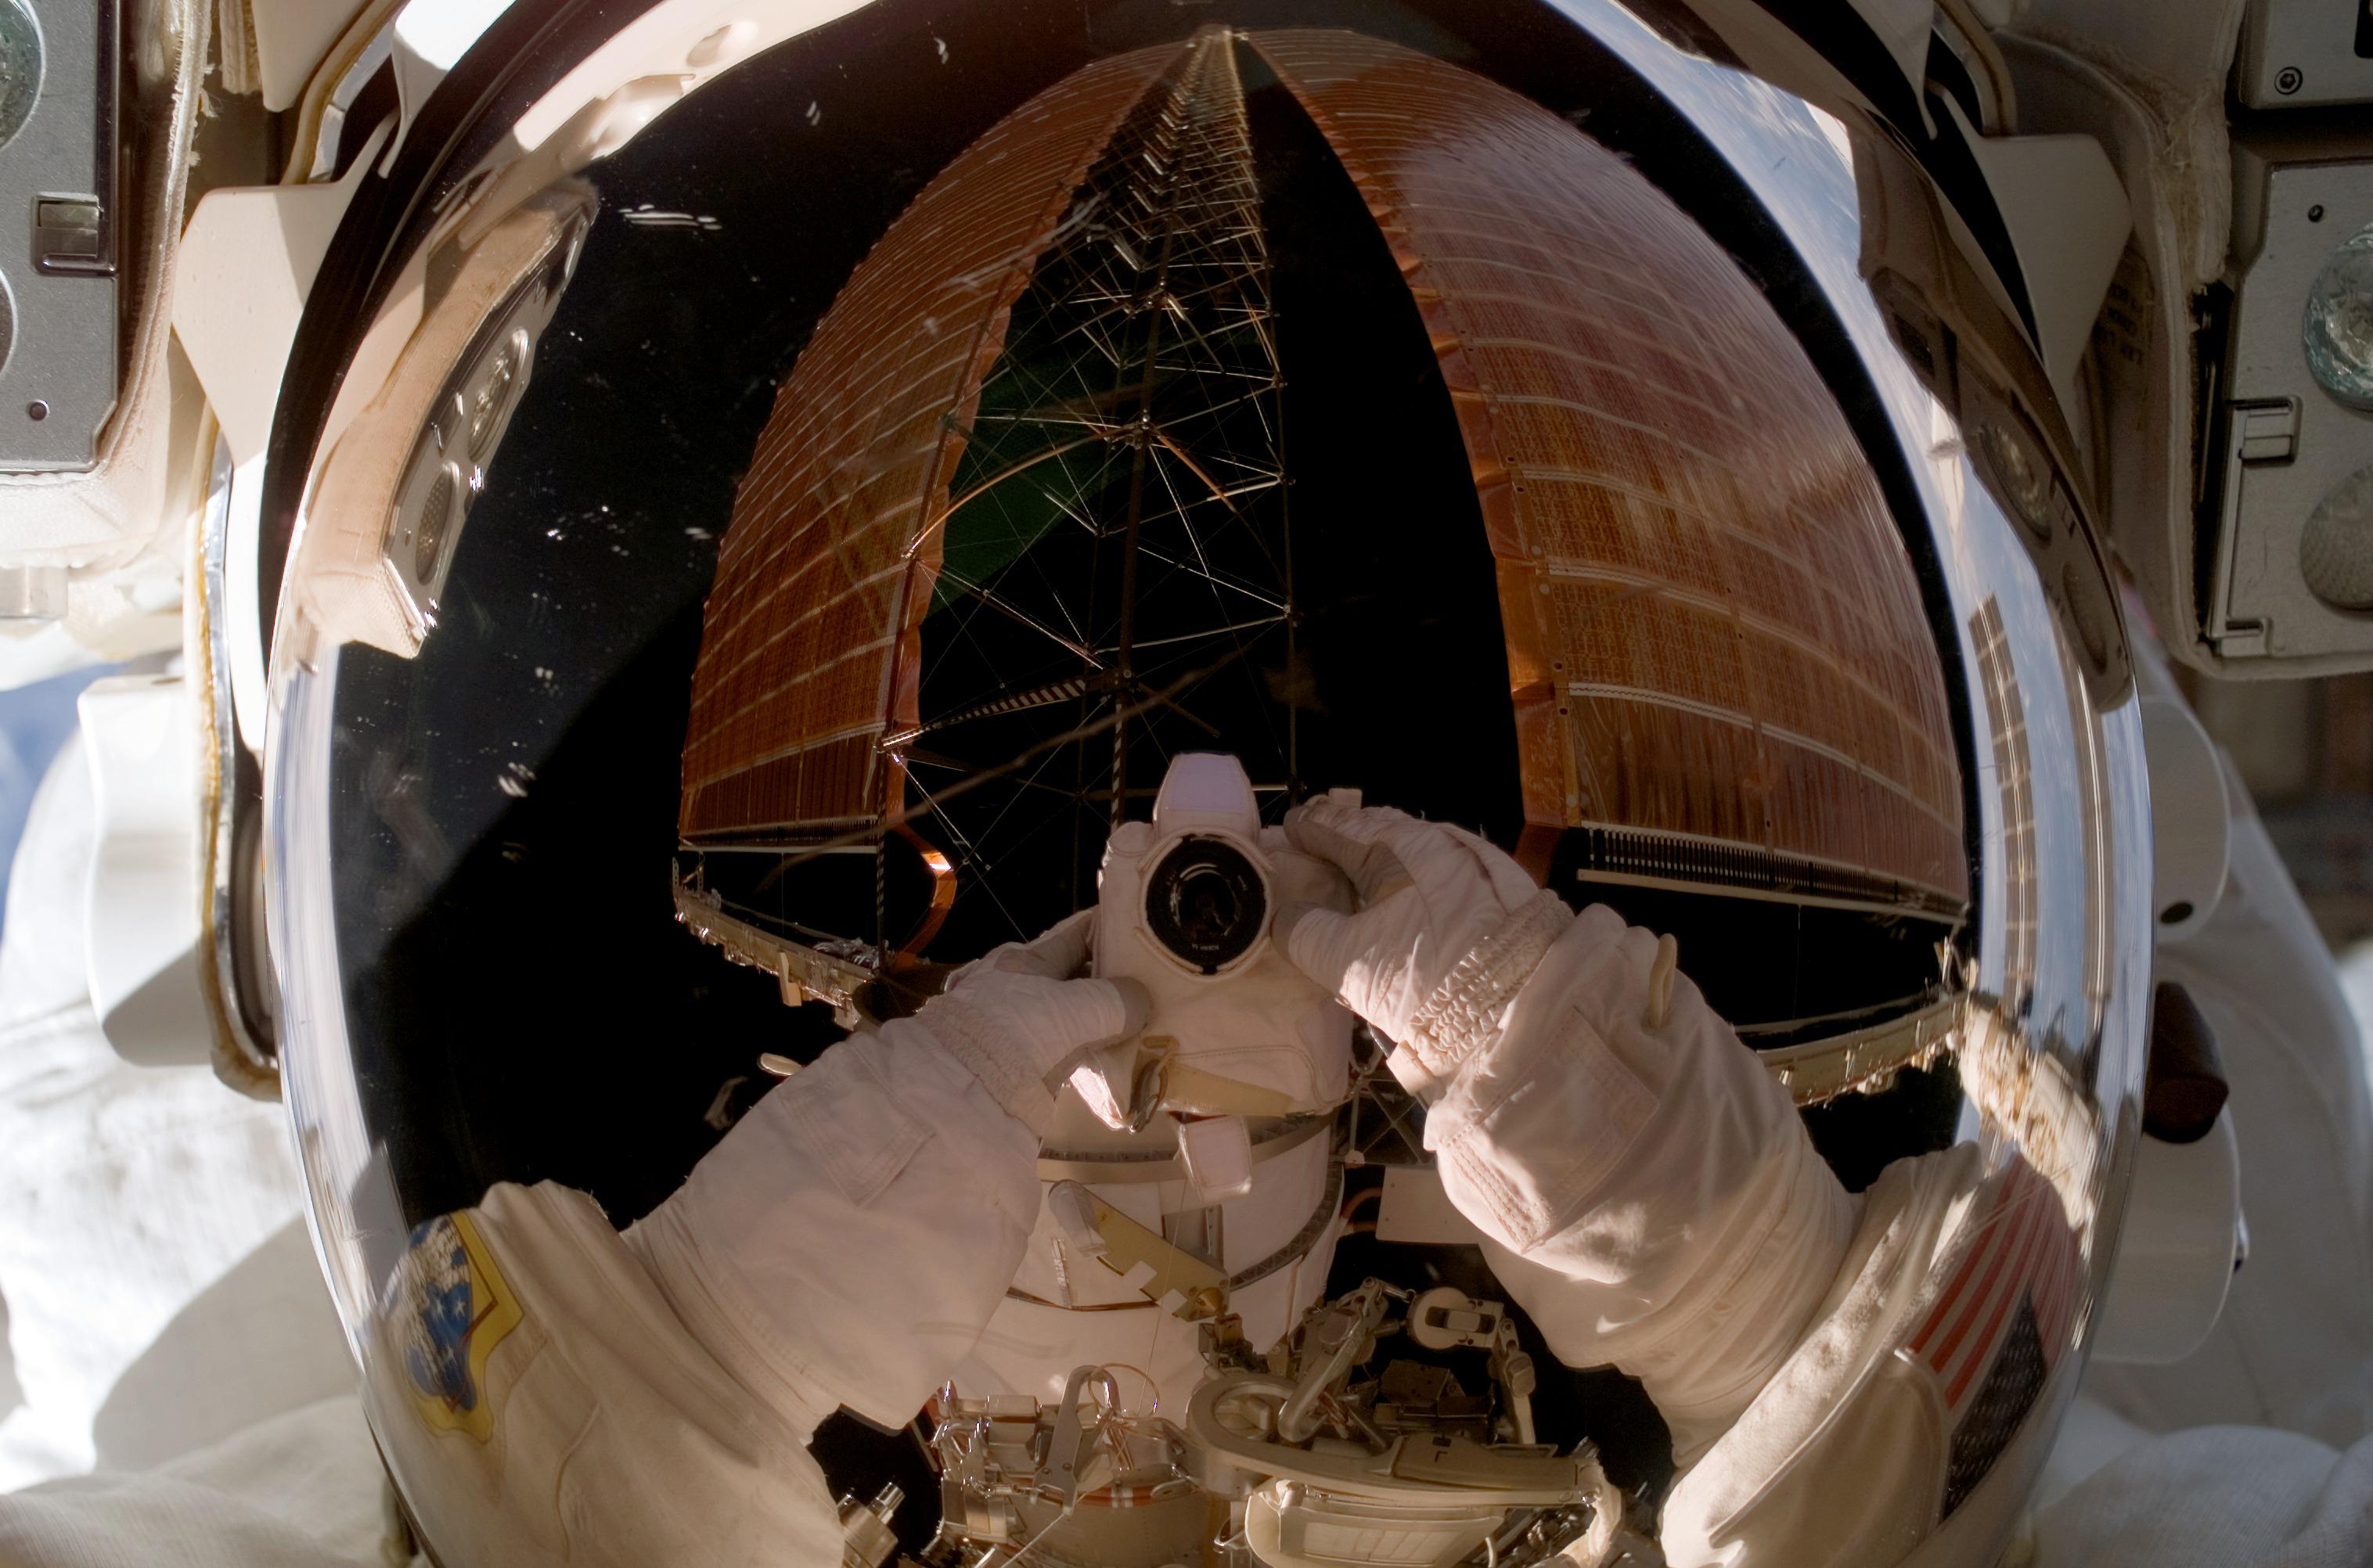 astronaut in orbit 1972 - photo #17